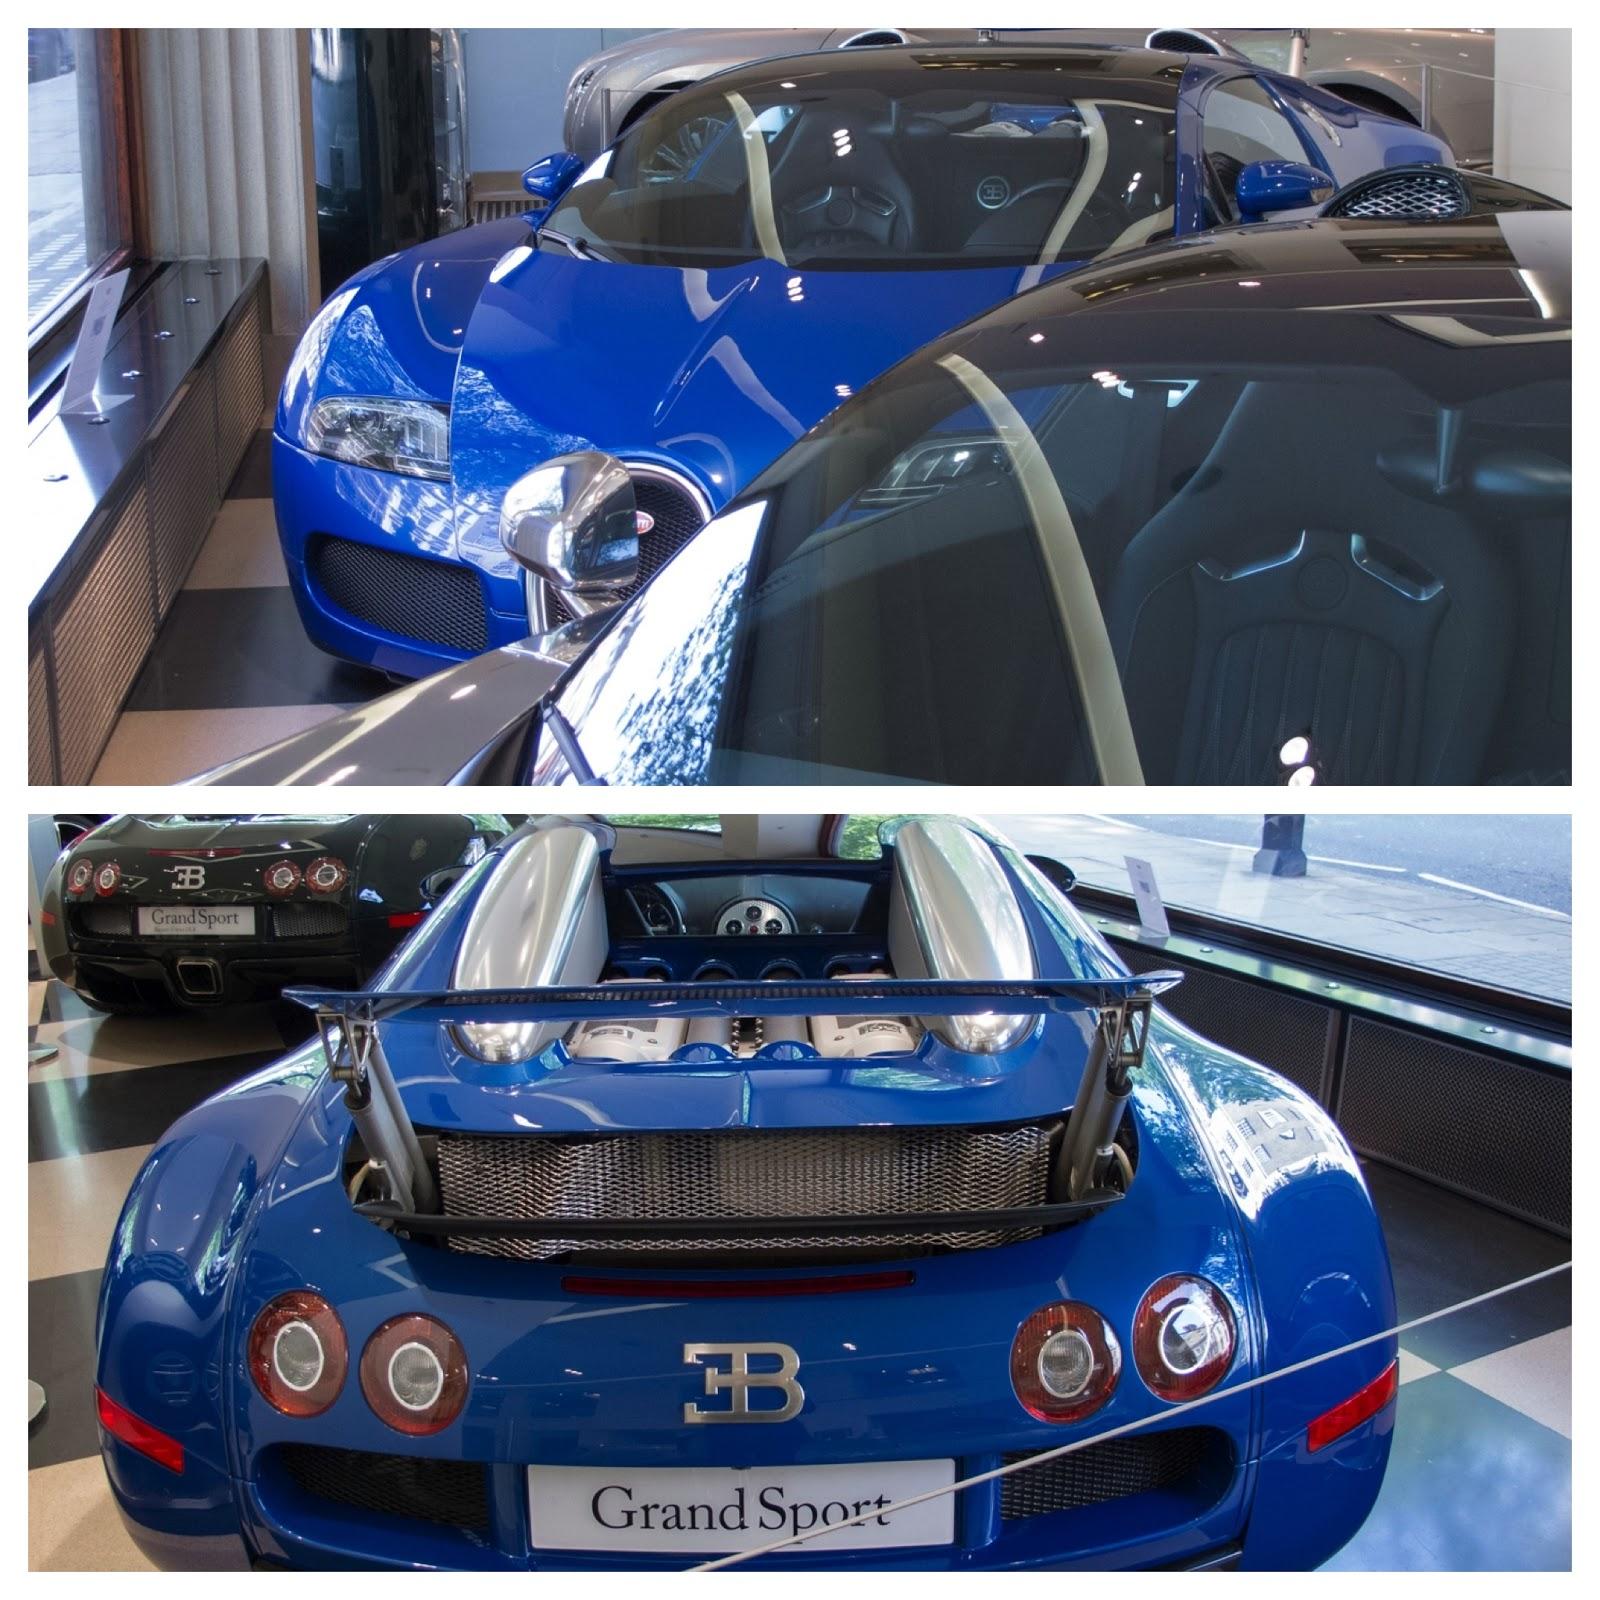 Bugatti Sport: Second Hand Bugatti Veyron Grand Sport